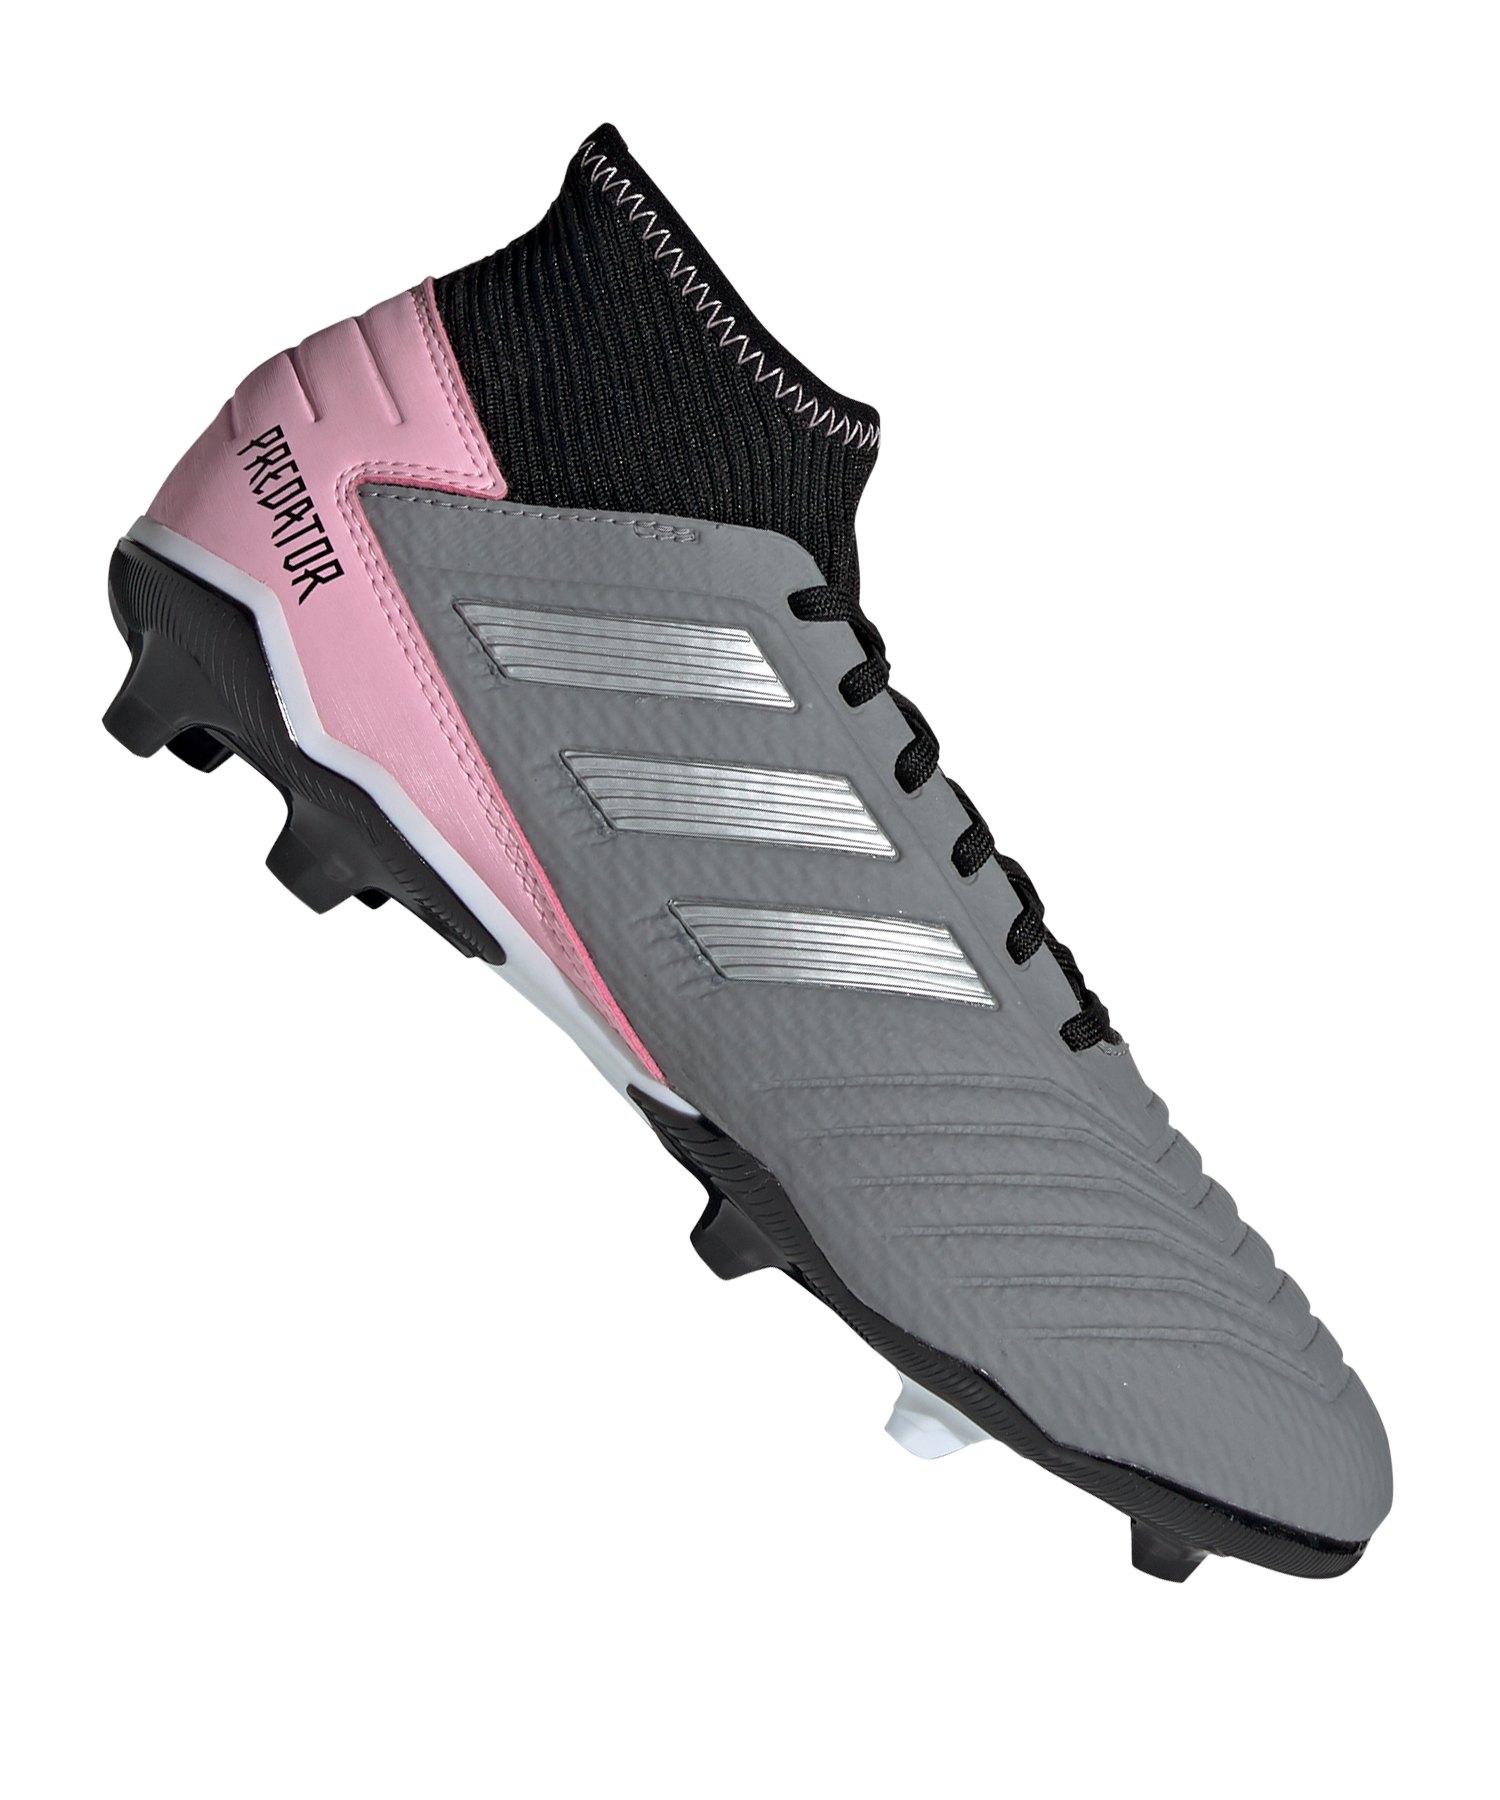 check out 1d2cb 0f84a adidas Predator 19.3 FG Damen Schwarz Pink - schwarz